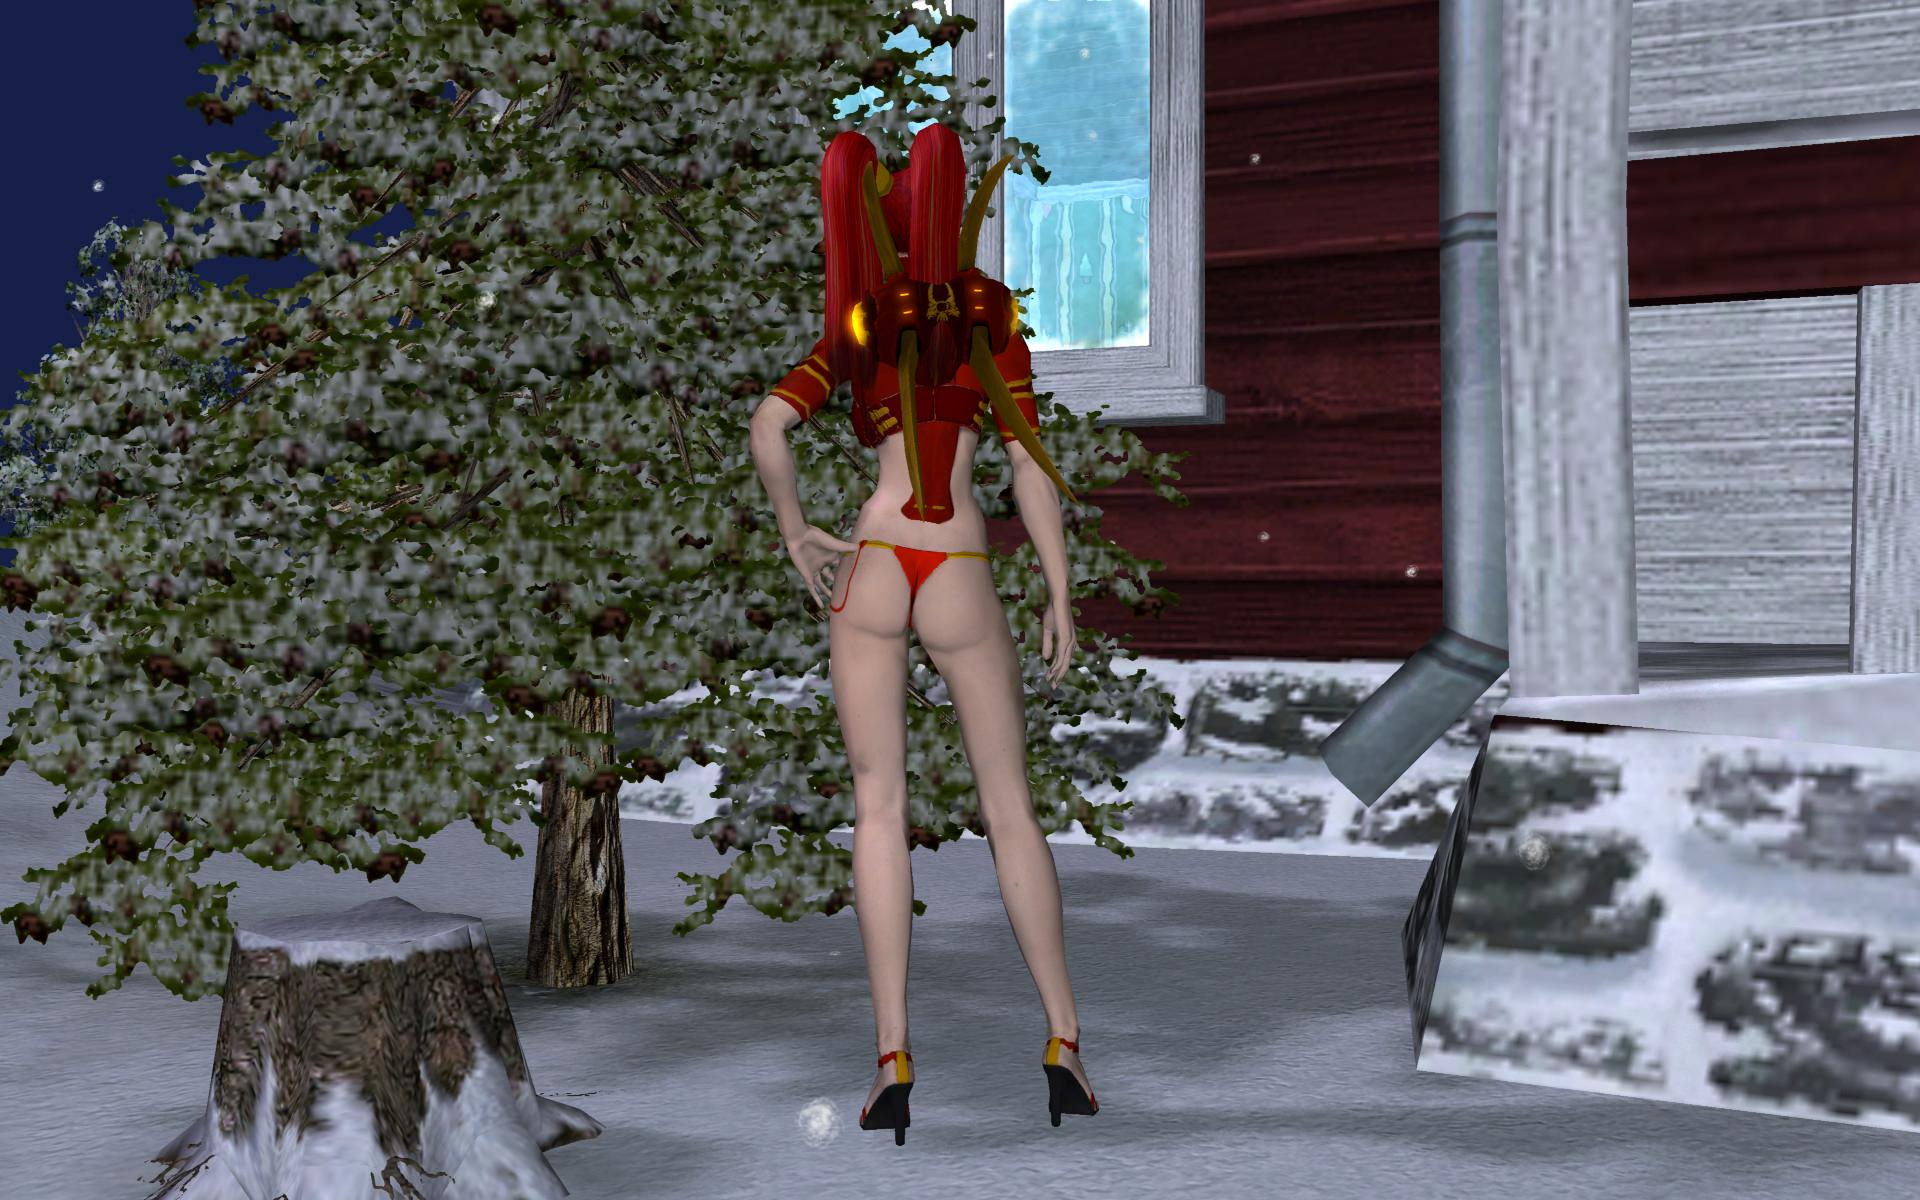 Sacred 3 nude mod hentia videos